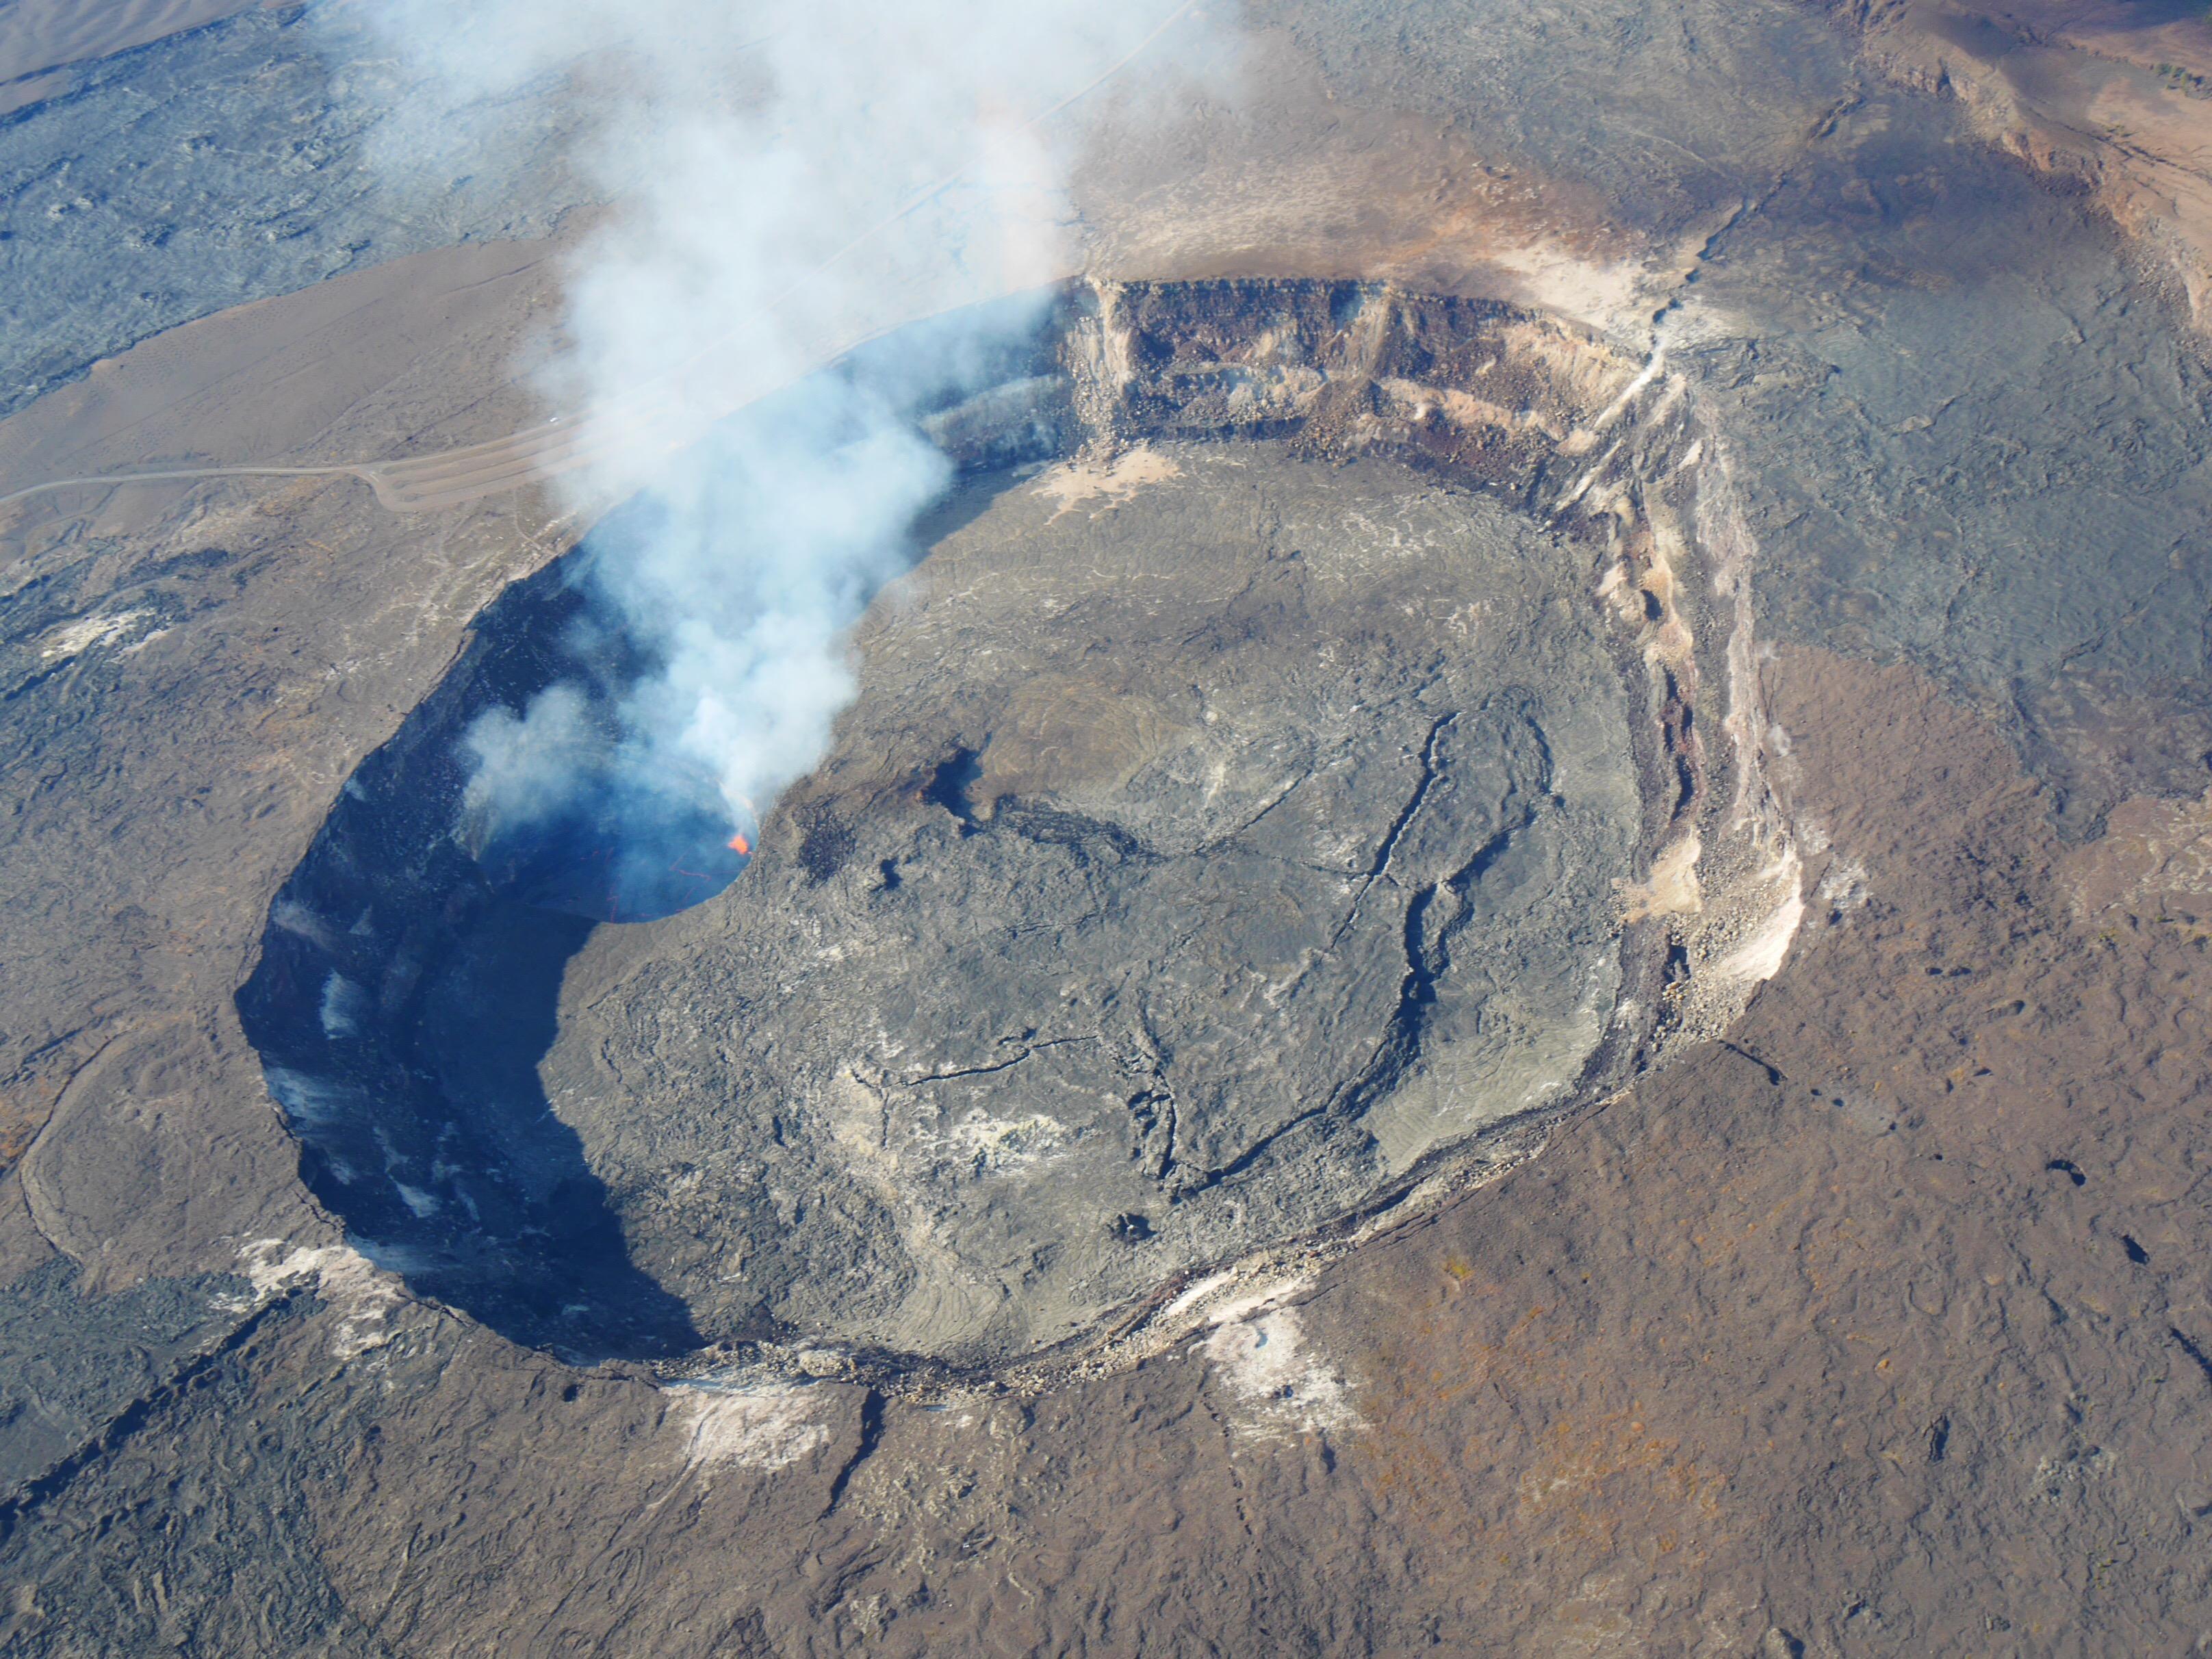 Kīlauea, the world's most active volcano